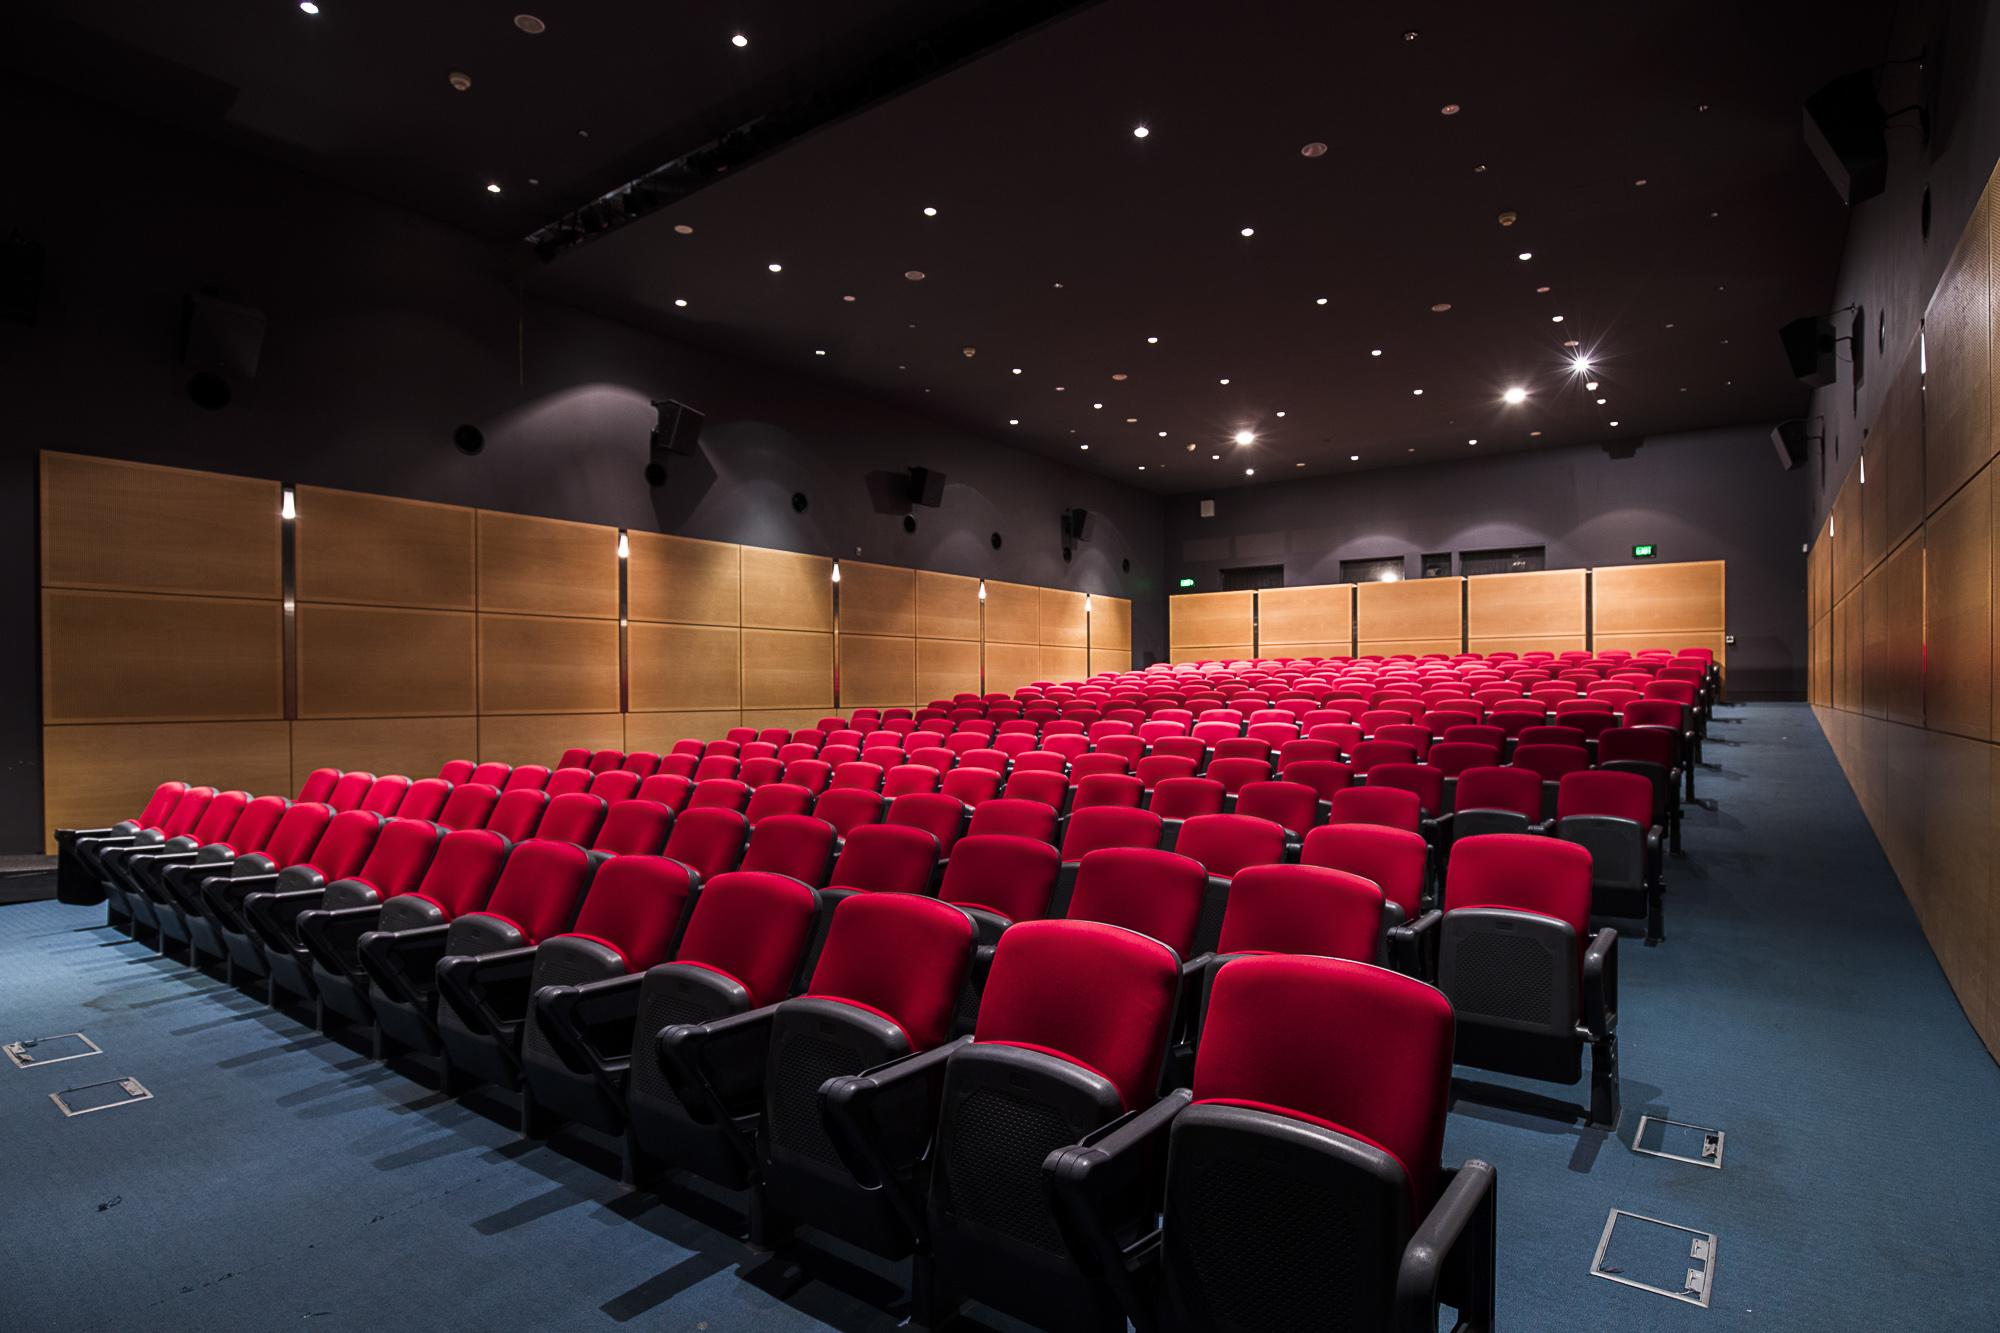 UNSW_Ritchie_Theatre-005.jpg